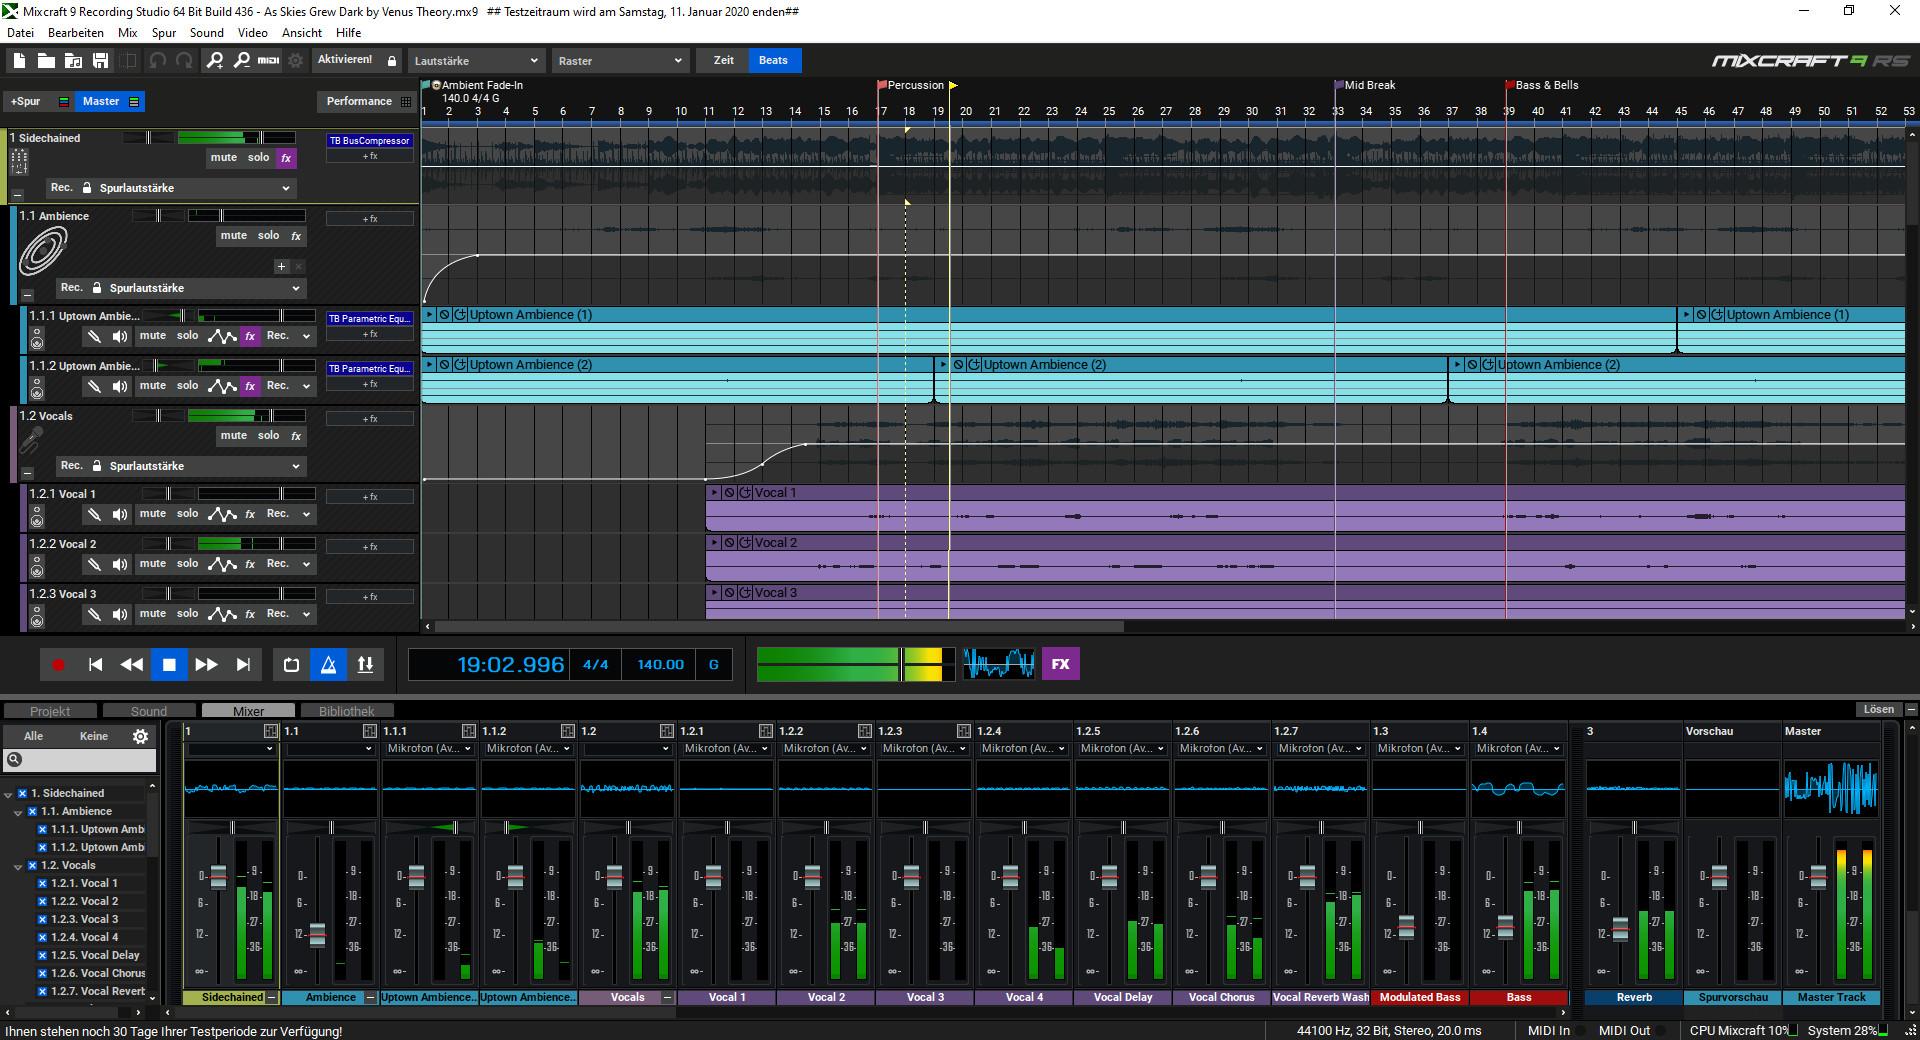 Screenshot 1 - Mixcraft Recording Studio